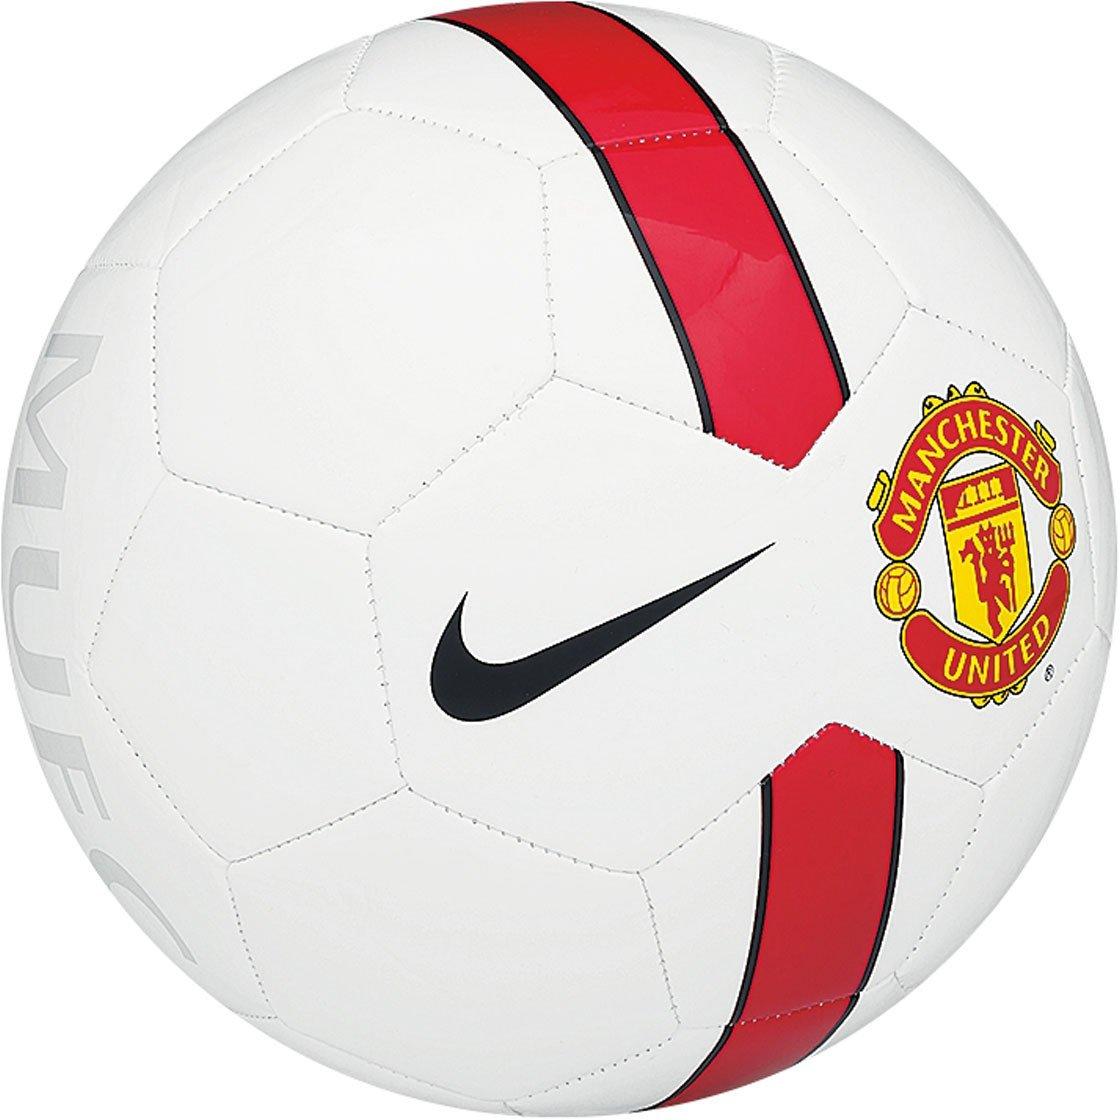 Nike - Pelota de fútbol, diseño del Manchester United, color ...